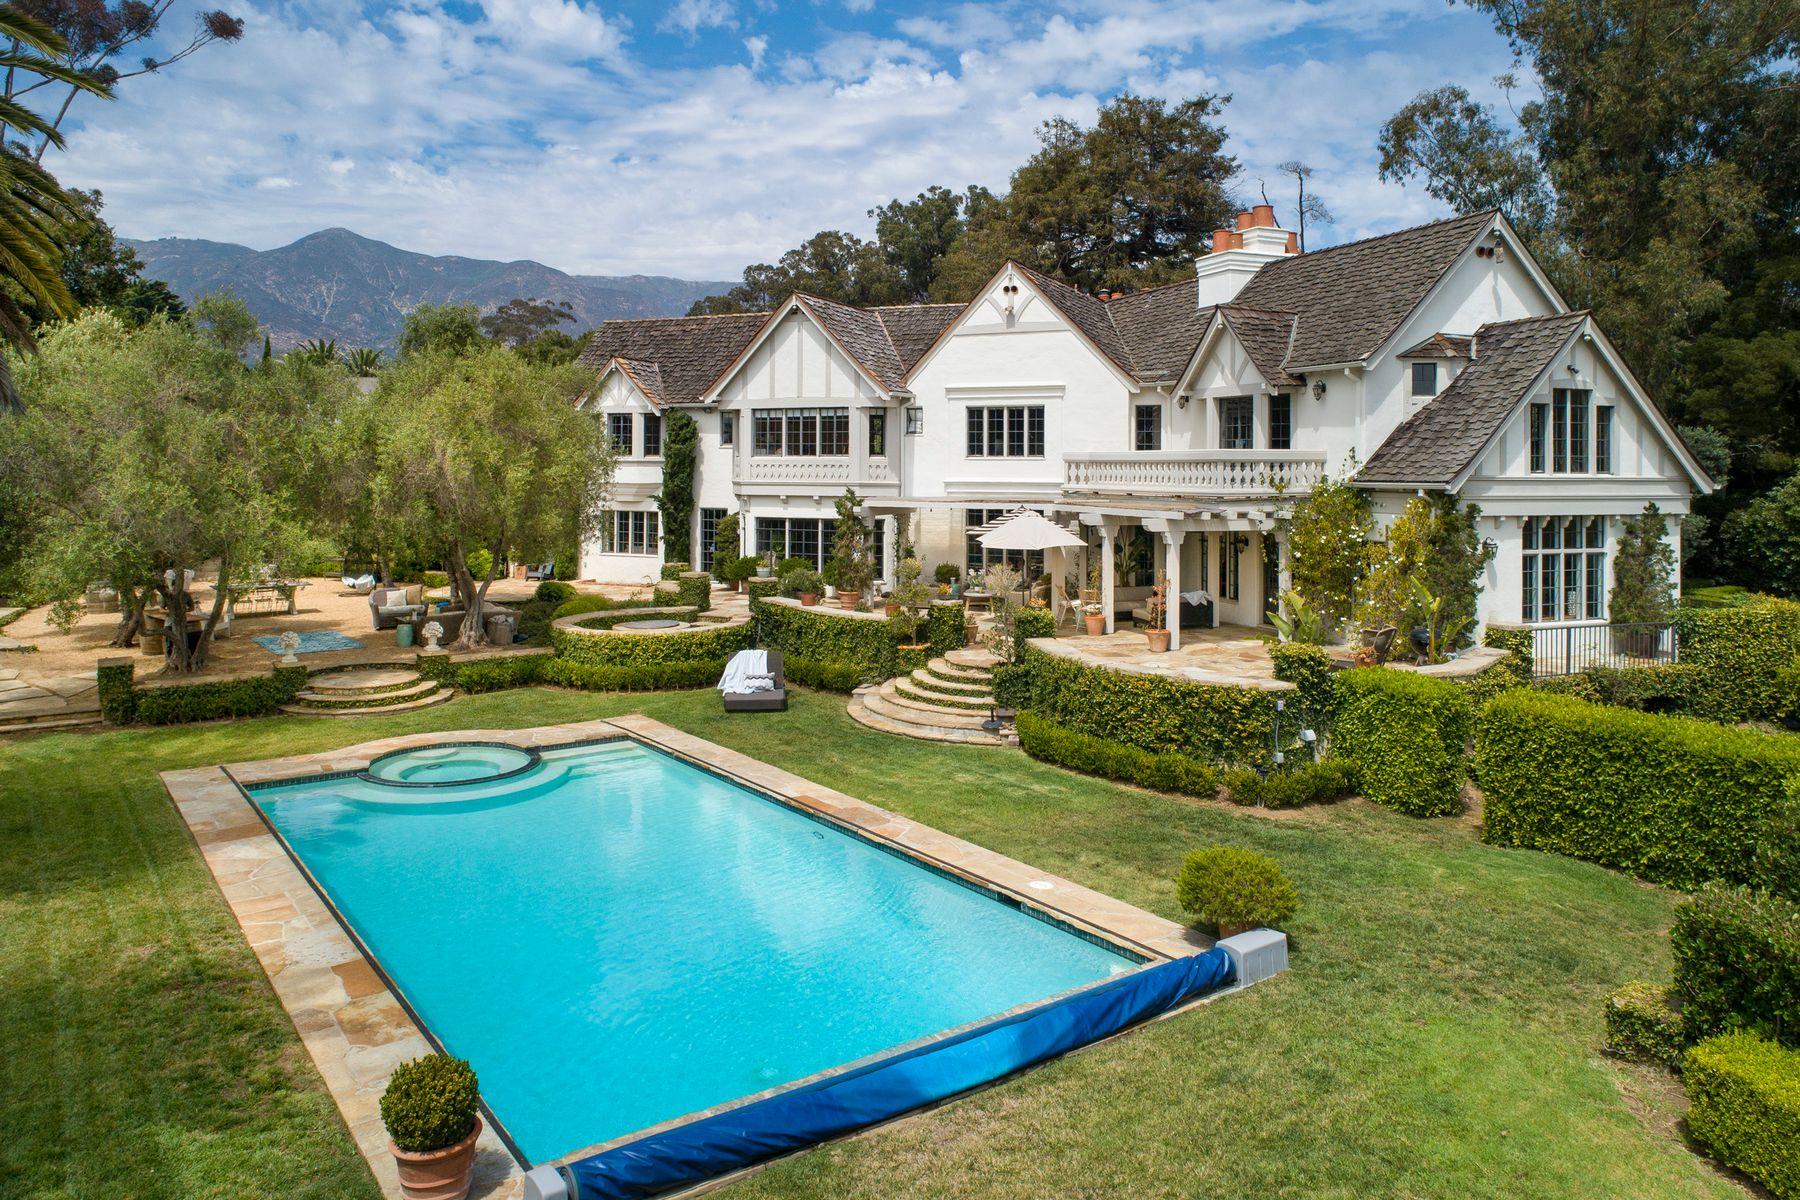 Single Family Homes for Sale at Landmark Character Montecito Estate 165 Middle Road Santa Barbara, California 93108 United States